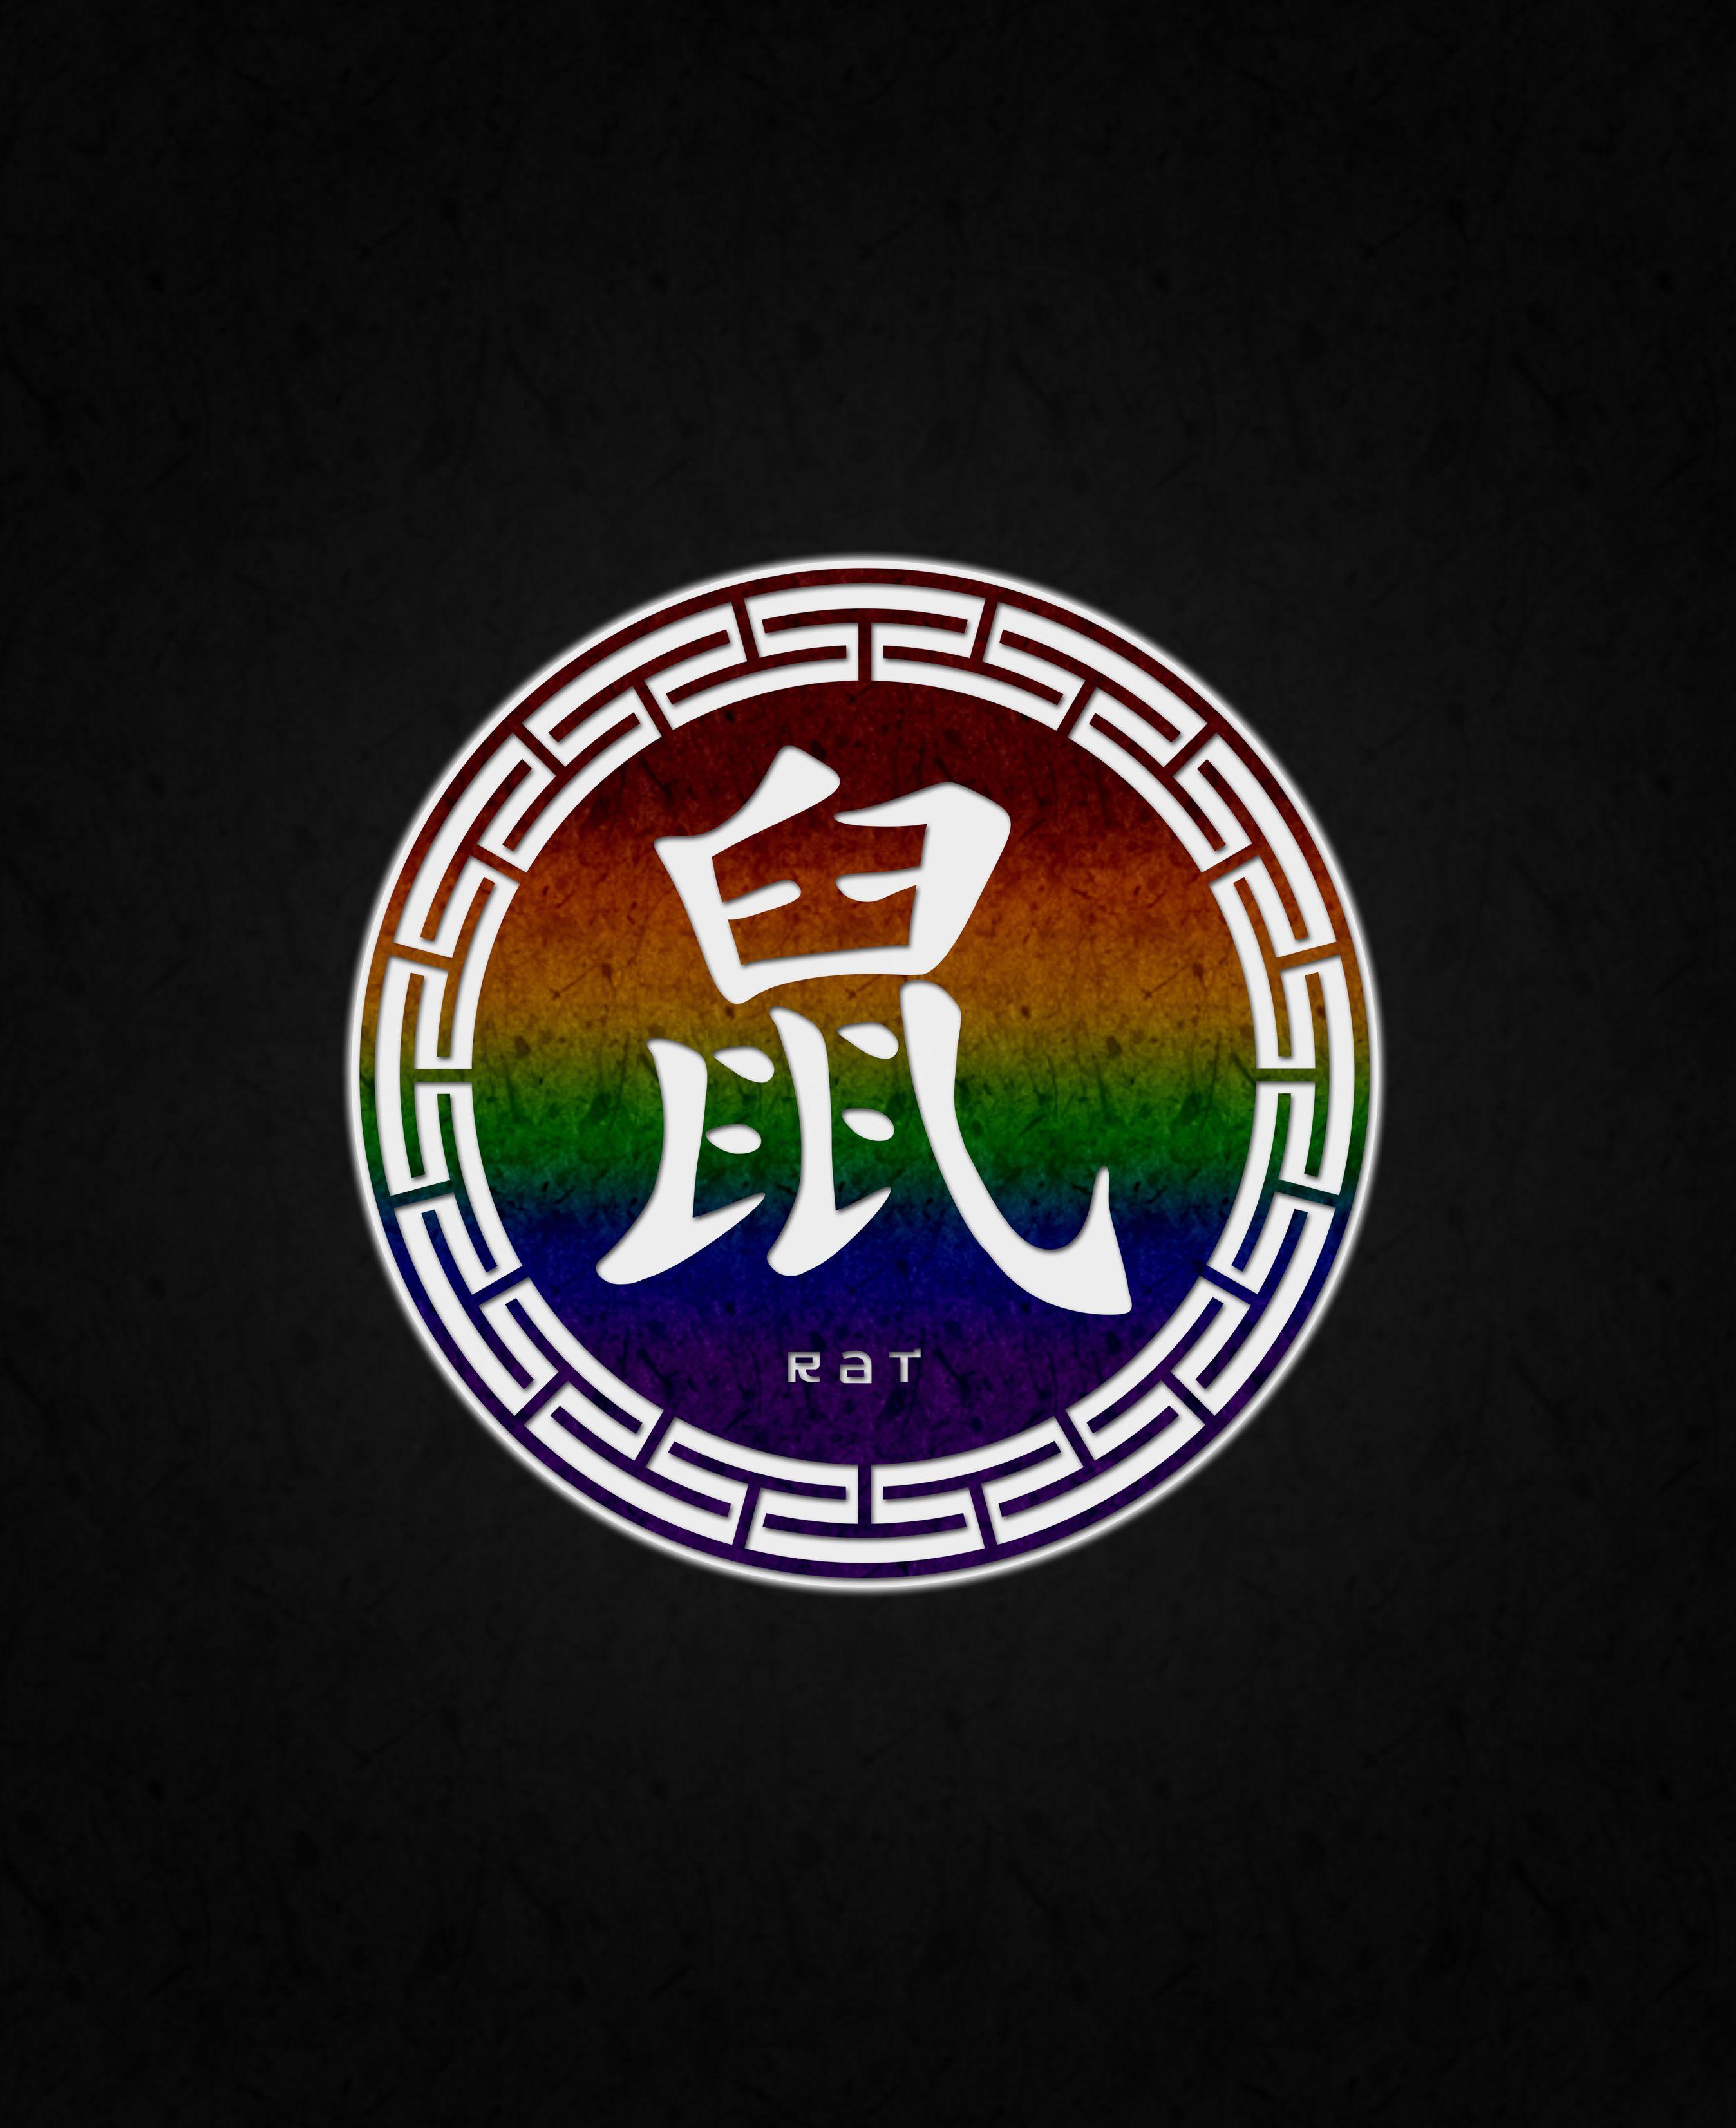 Lgbt pride chinese horoscope rat symbol in rainbow colors lgbt pride chinese horoscope ox symbol in rainbow colors buycottarizona